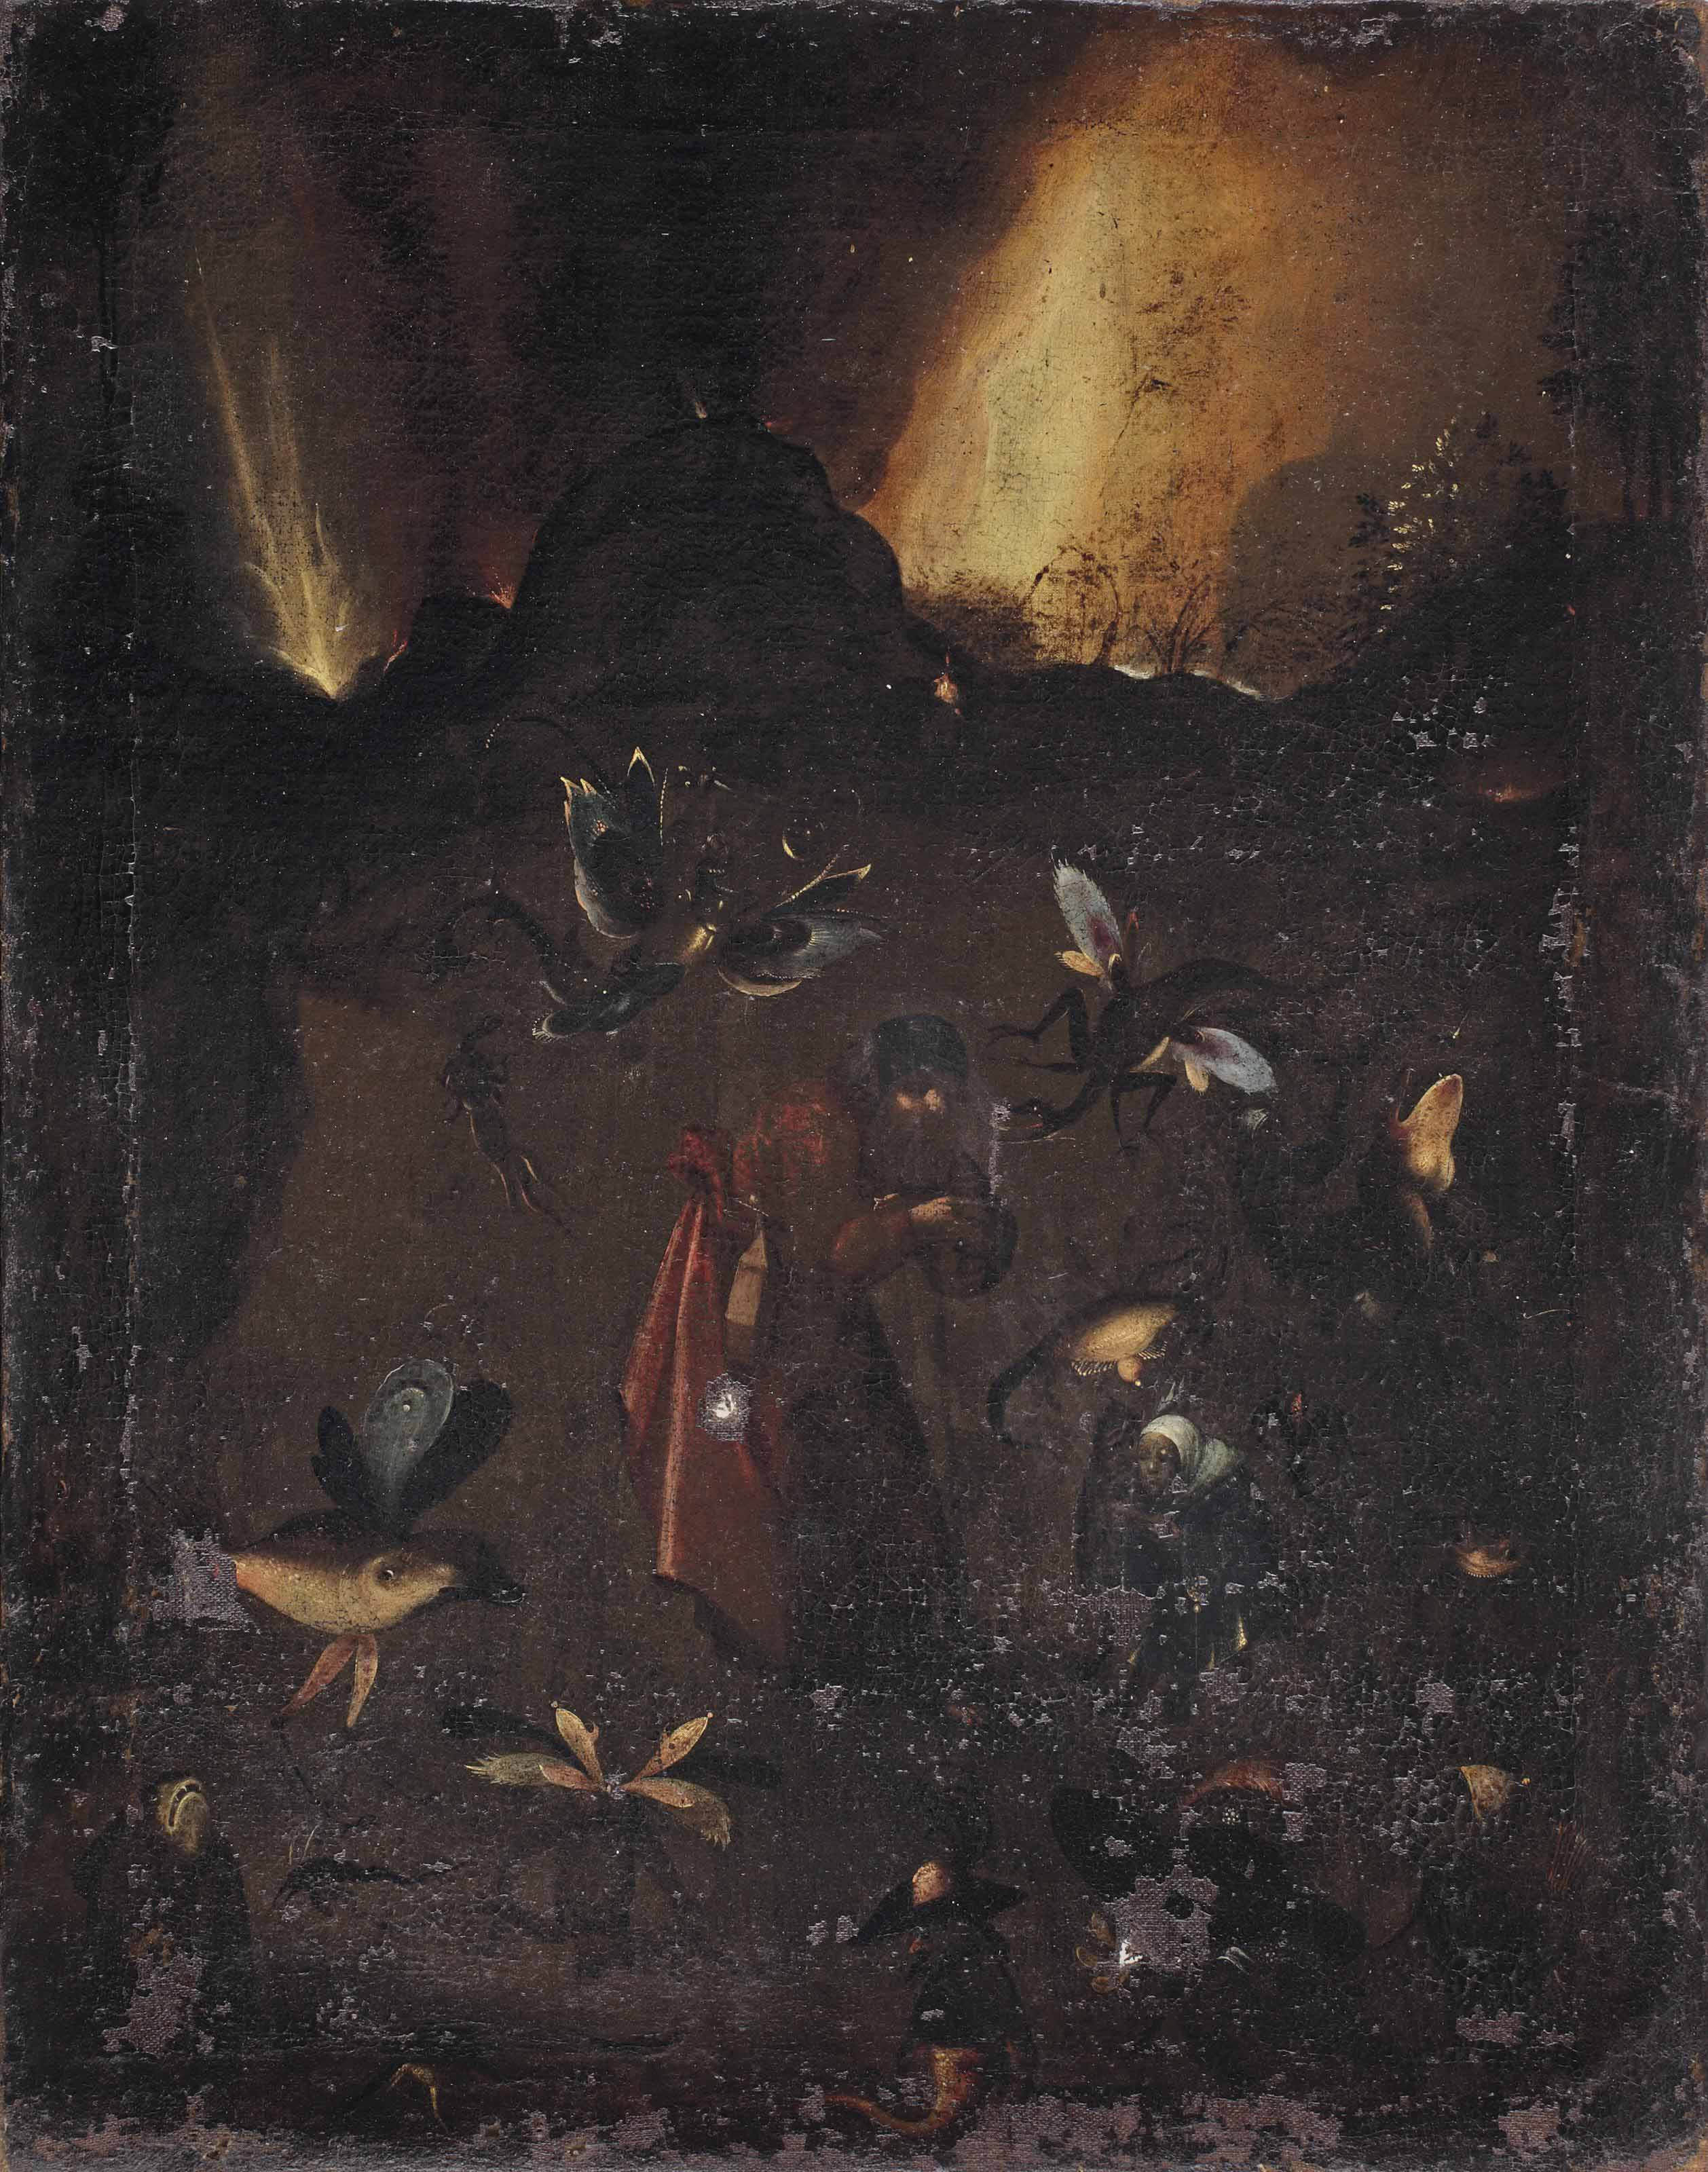 Follower of Jheronimus Bosch,